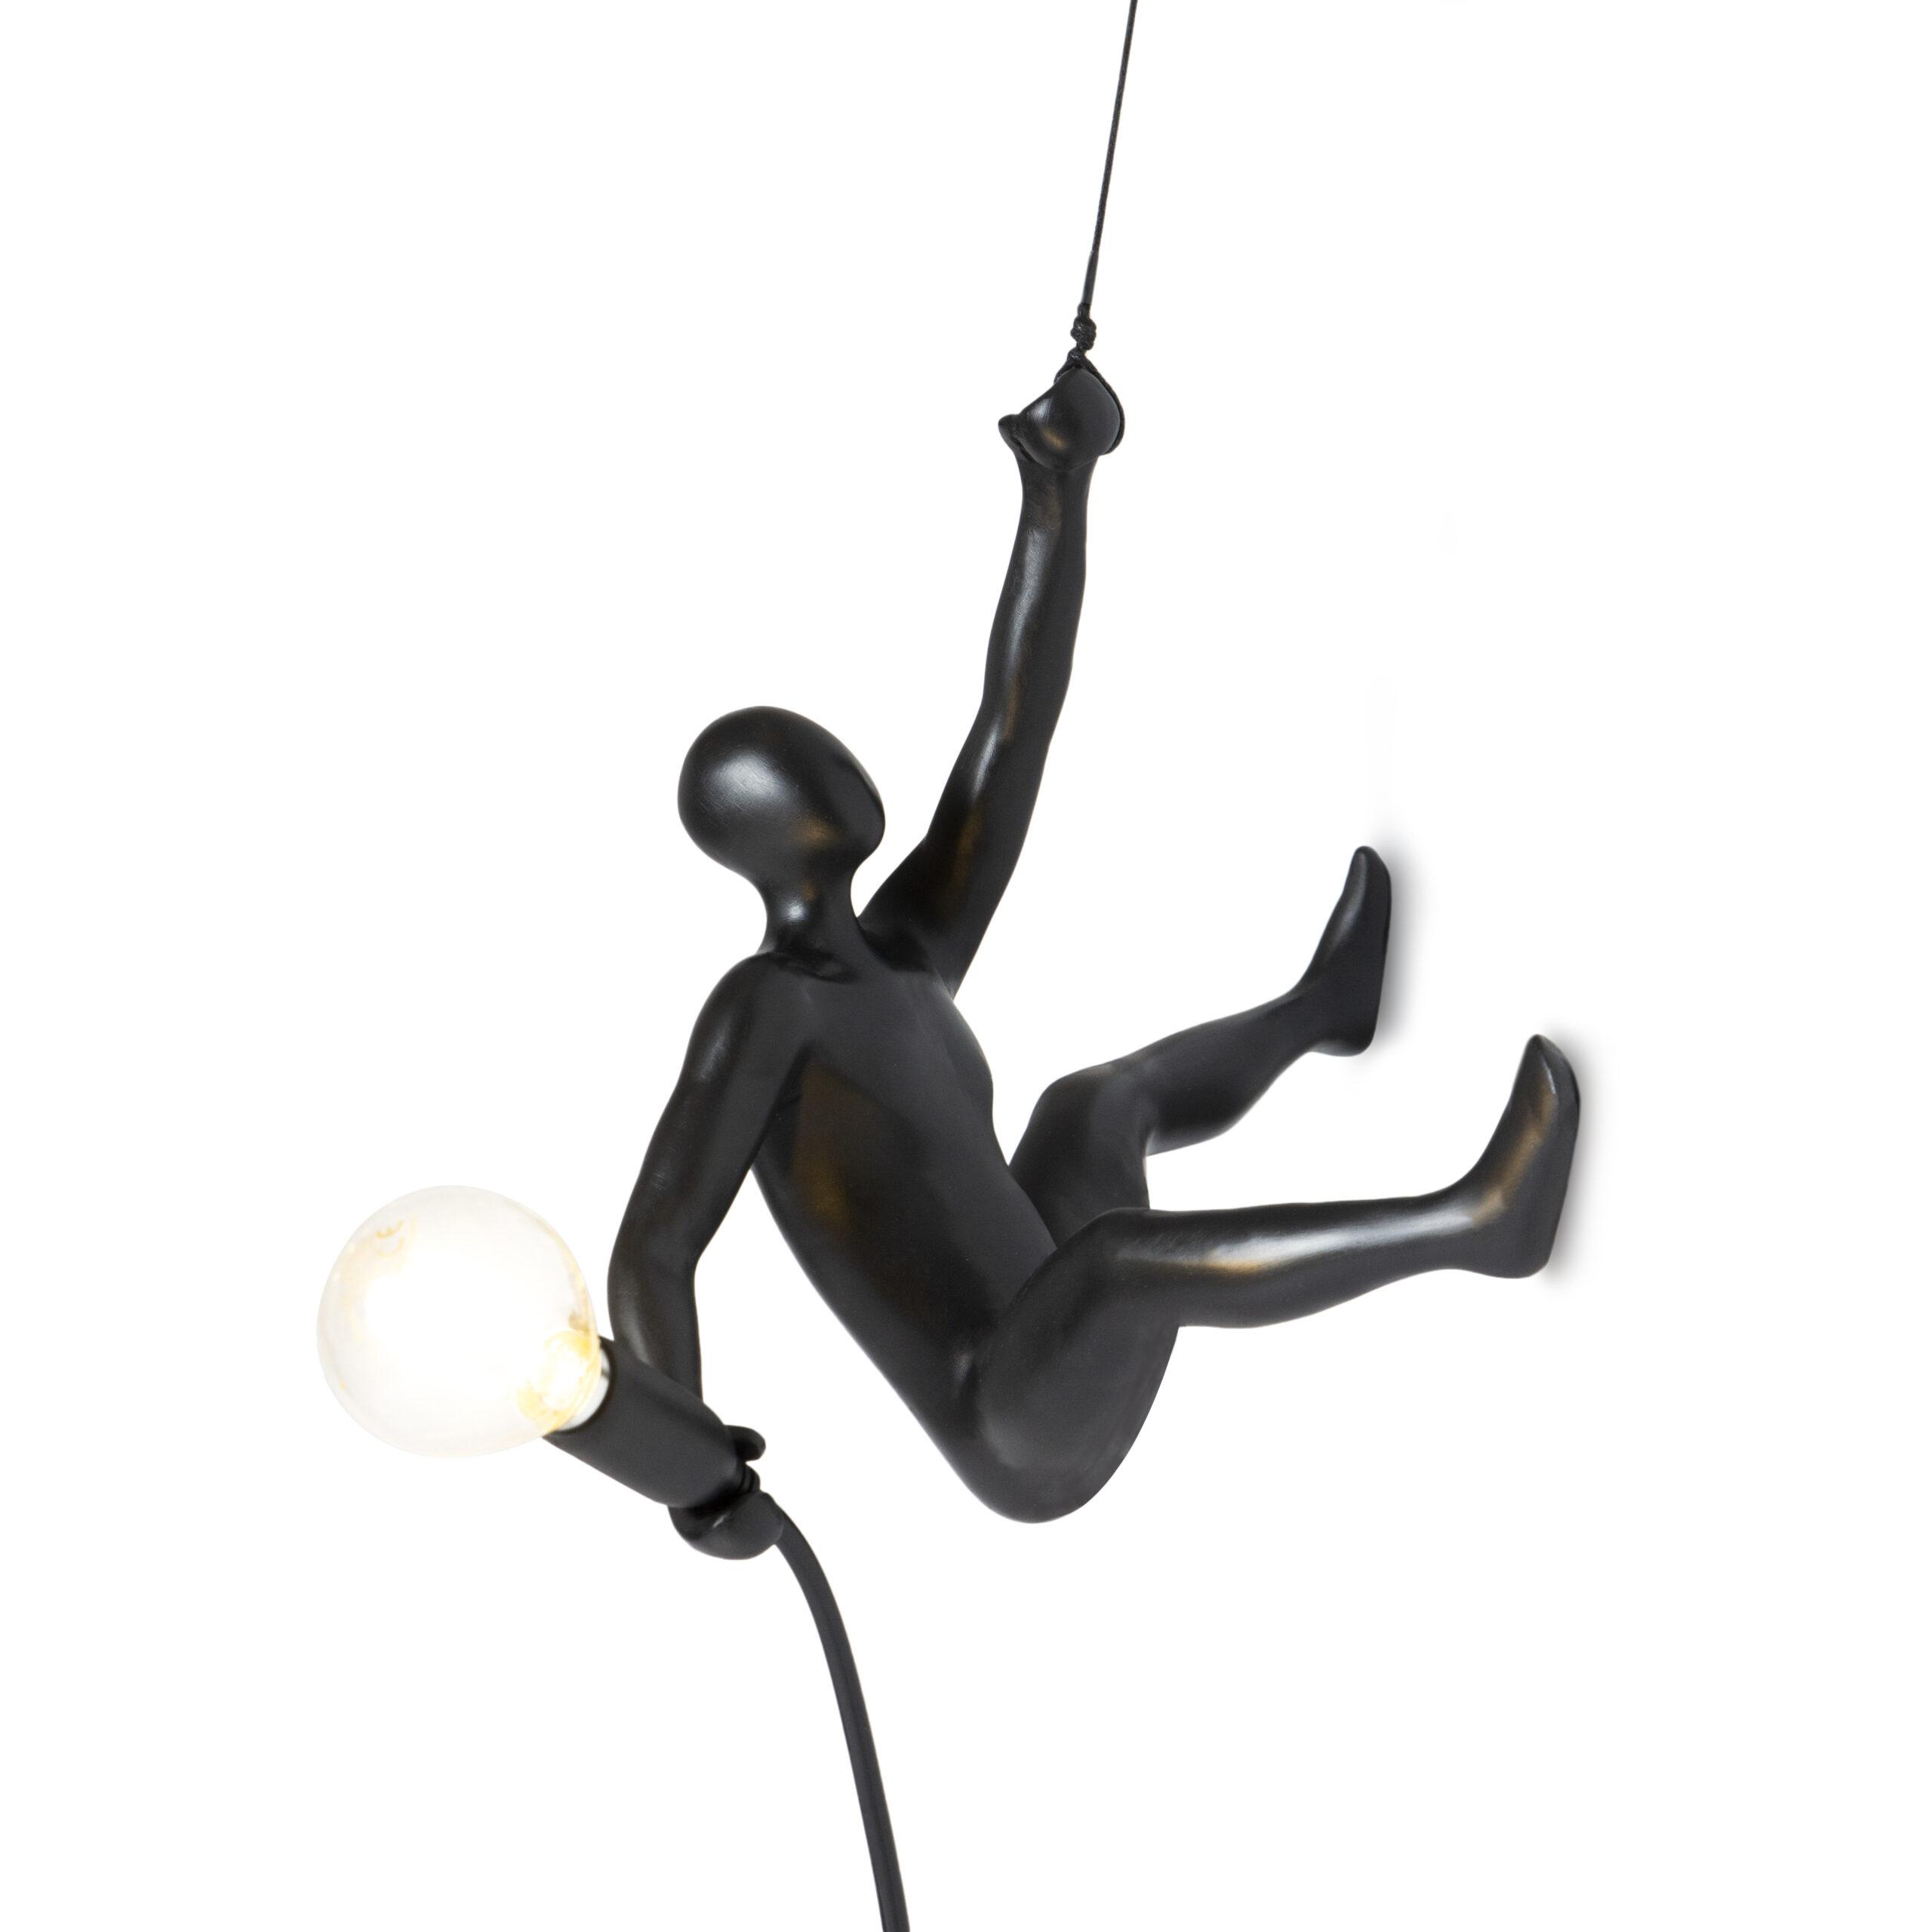 CL001_Werkwaardig_climberlamp_black_sideright_High